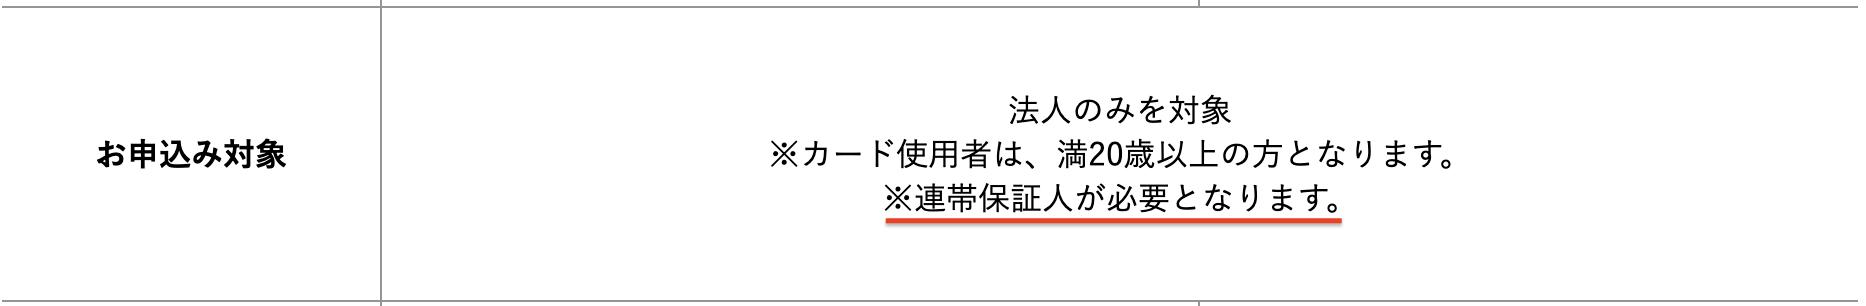 NTTファイナンスBizカードの申し込み対象